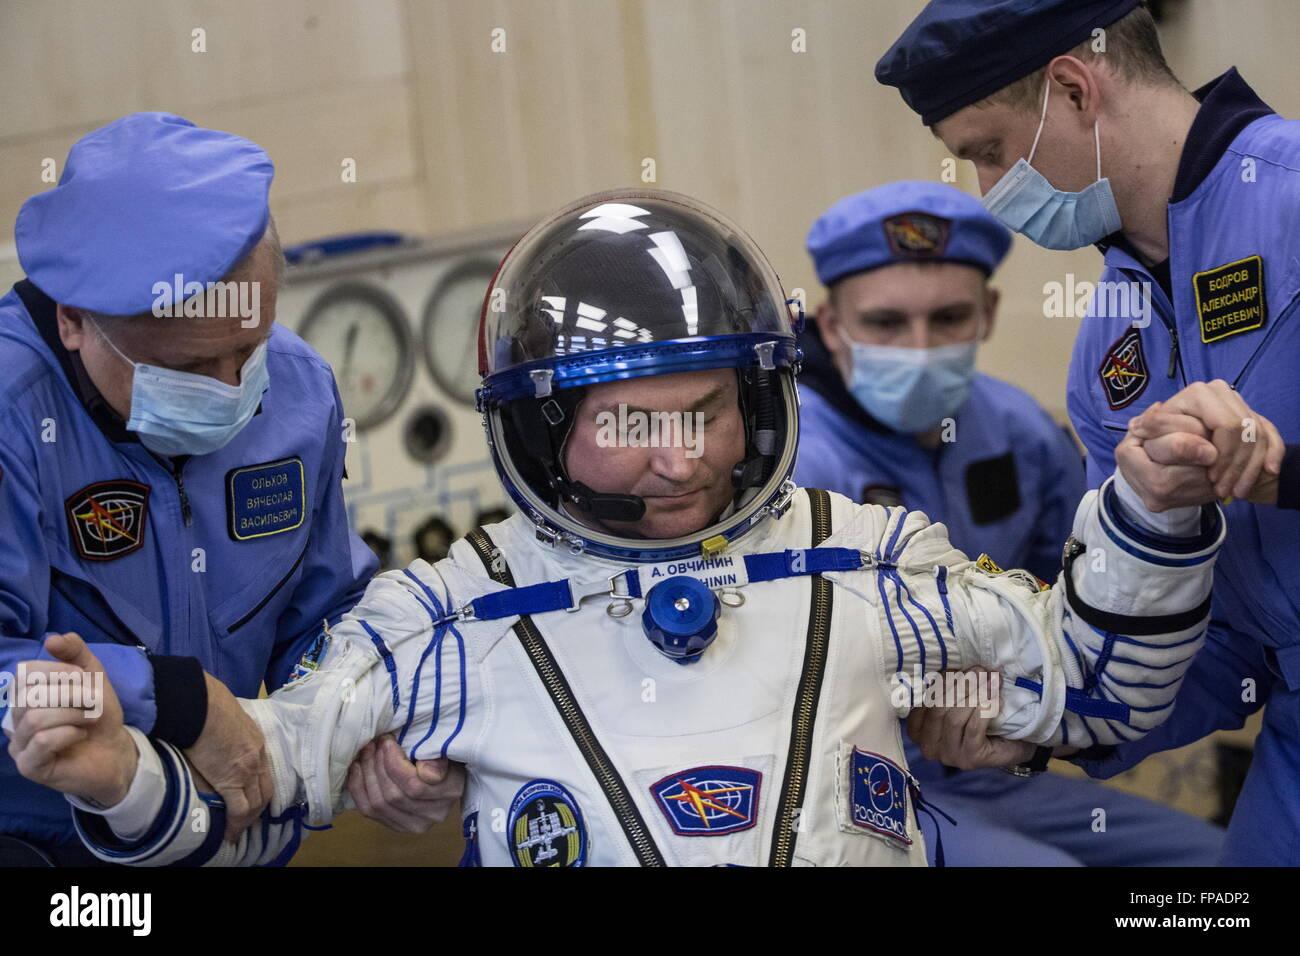 Baikonur, Kazakhstan. 18th Mar, 2016. Crew member of Expedition 47/48, Roscosmos cosmonaut Alexei Ovchinin (C) during - Stock Image